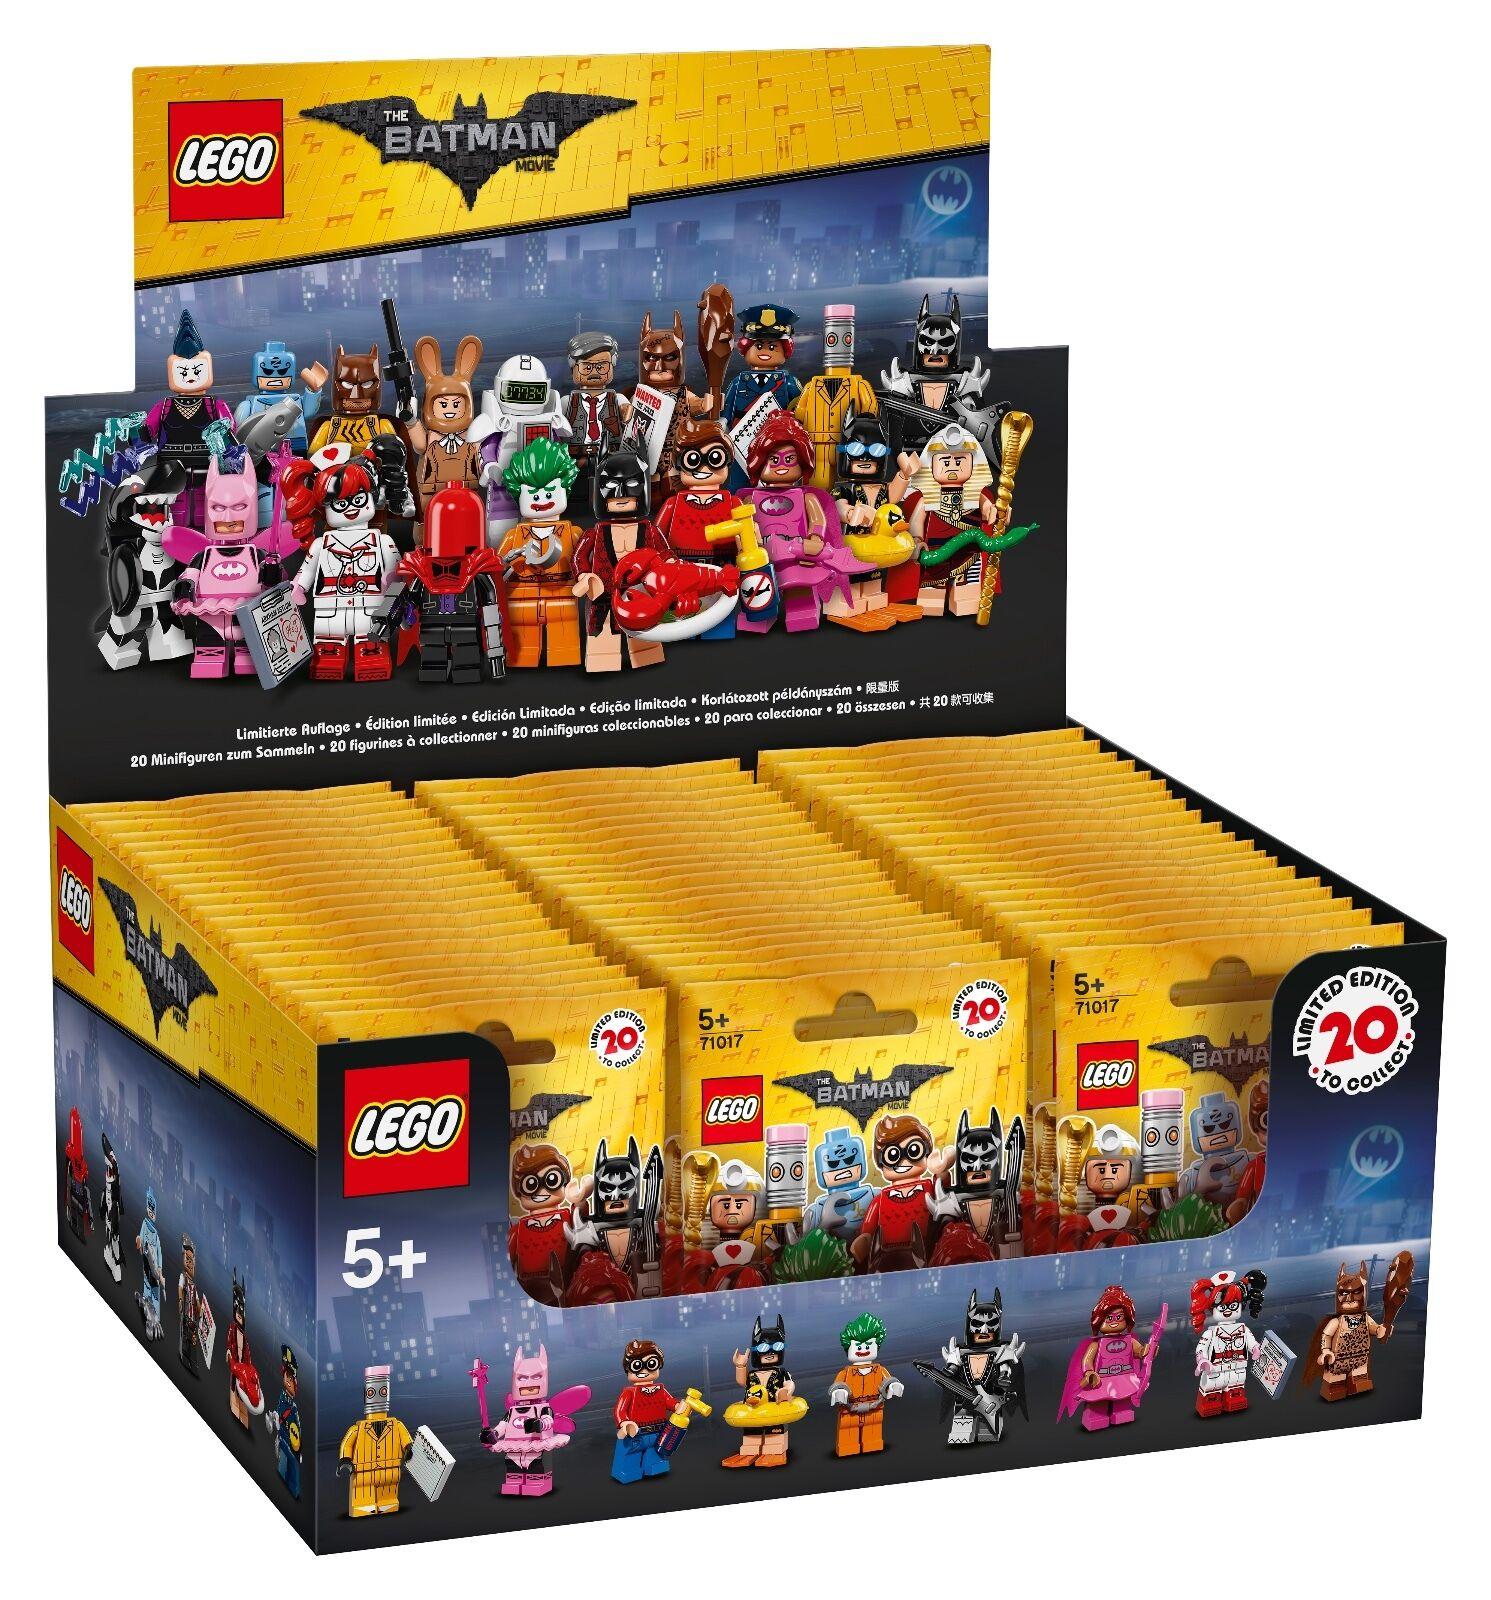 LEGO® THE LEGO® BATMAN MOVIE 71017 Minifigures NEU OVP NEW MISB NRFB